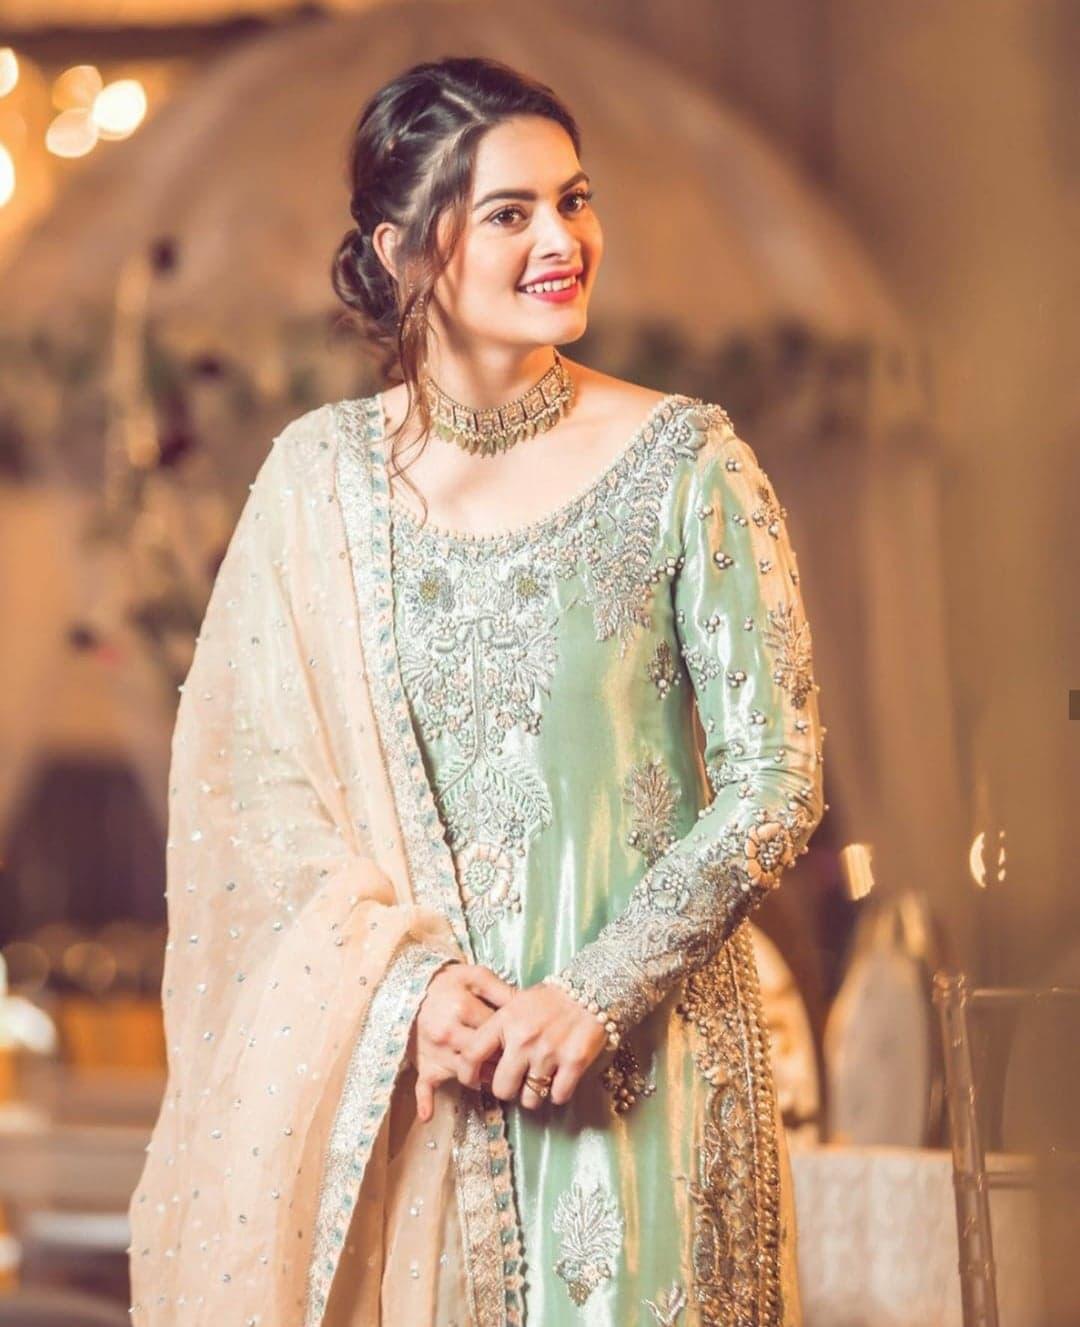 Top 10 Pakistani Celebrities Who Dress Up Modestly